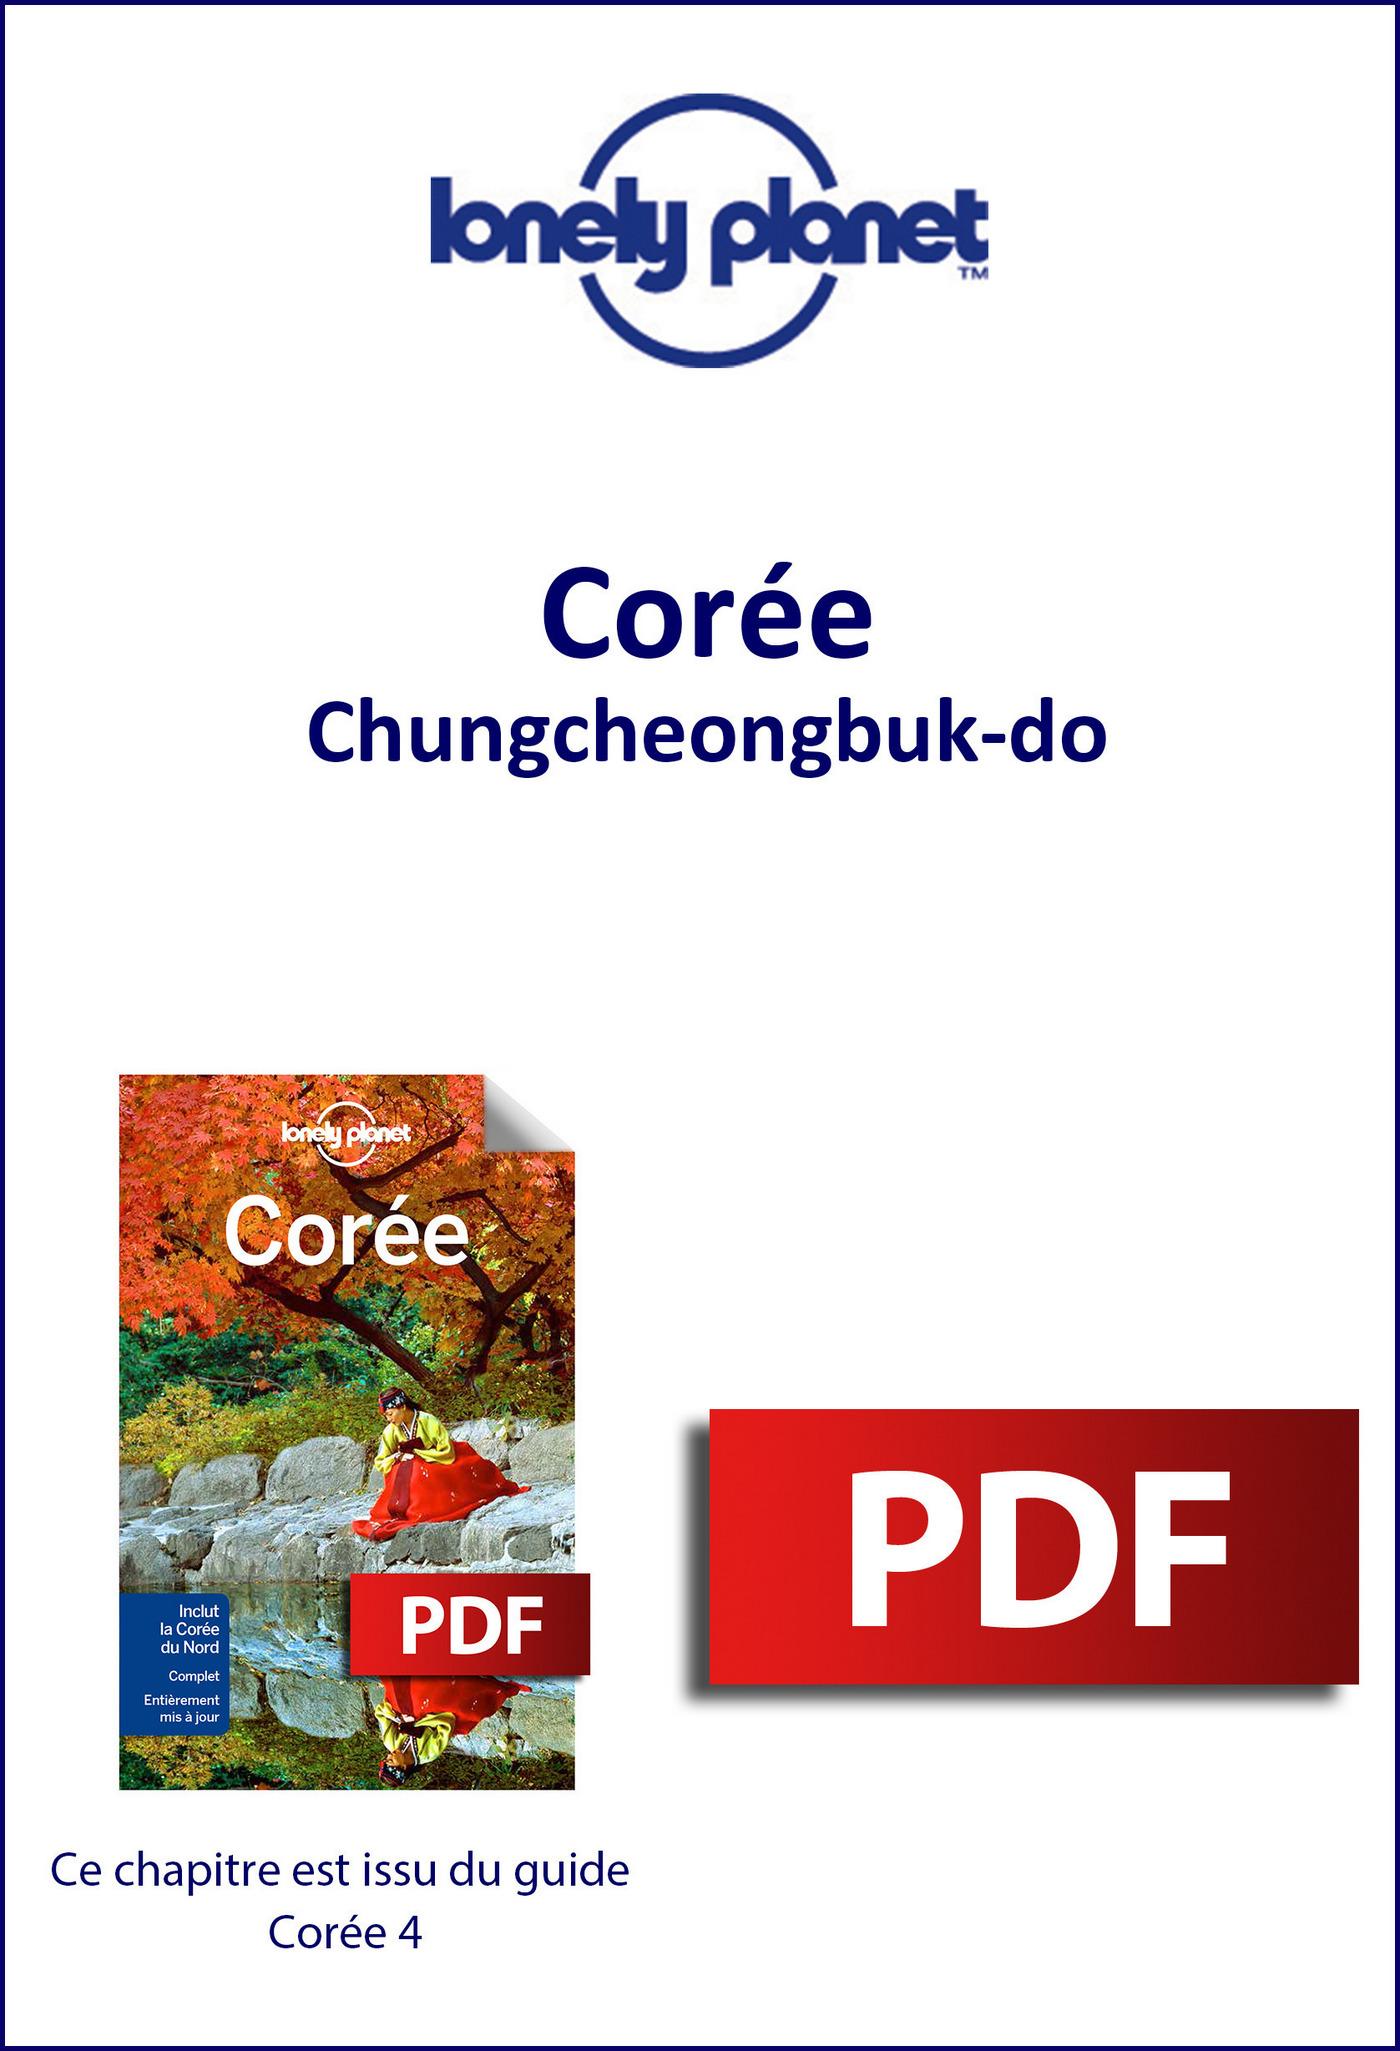 Corée - Chungcheongbuk-do